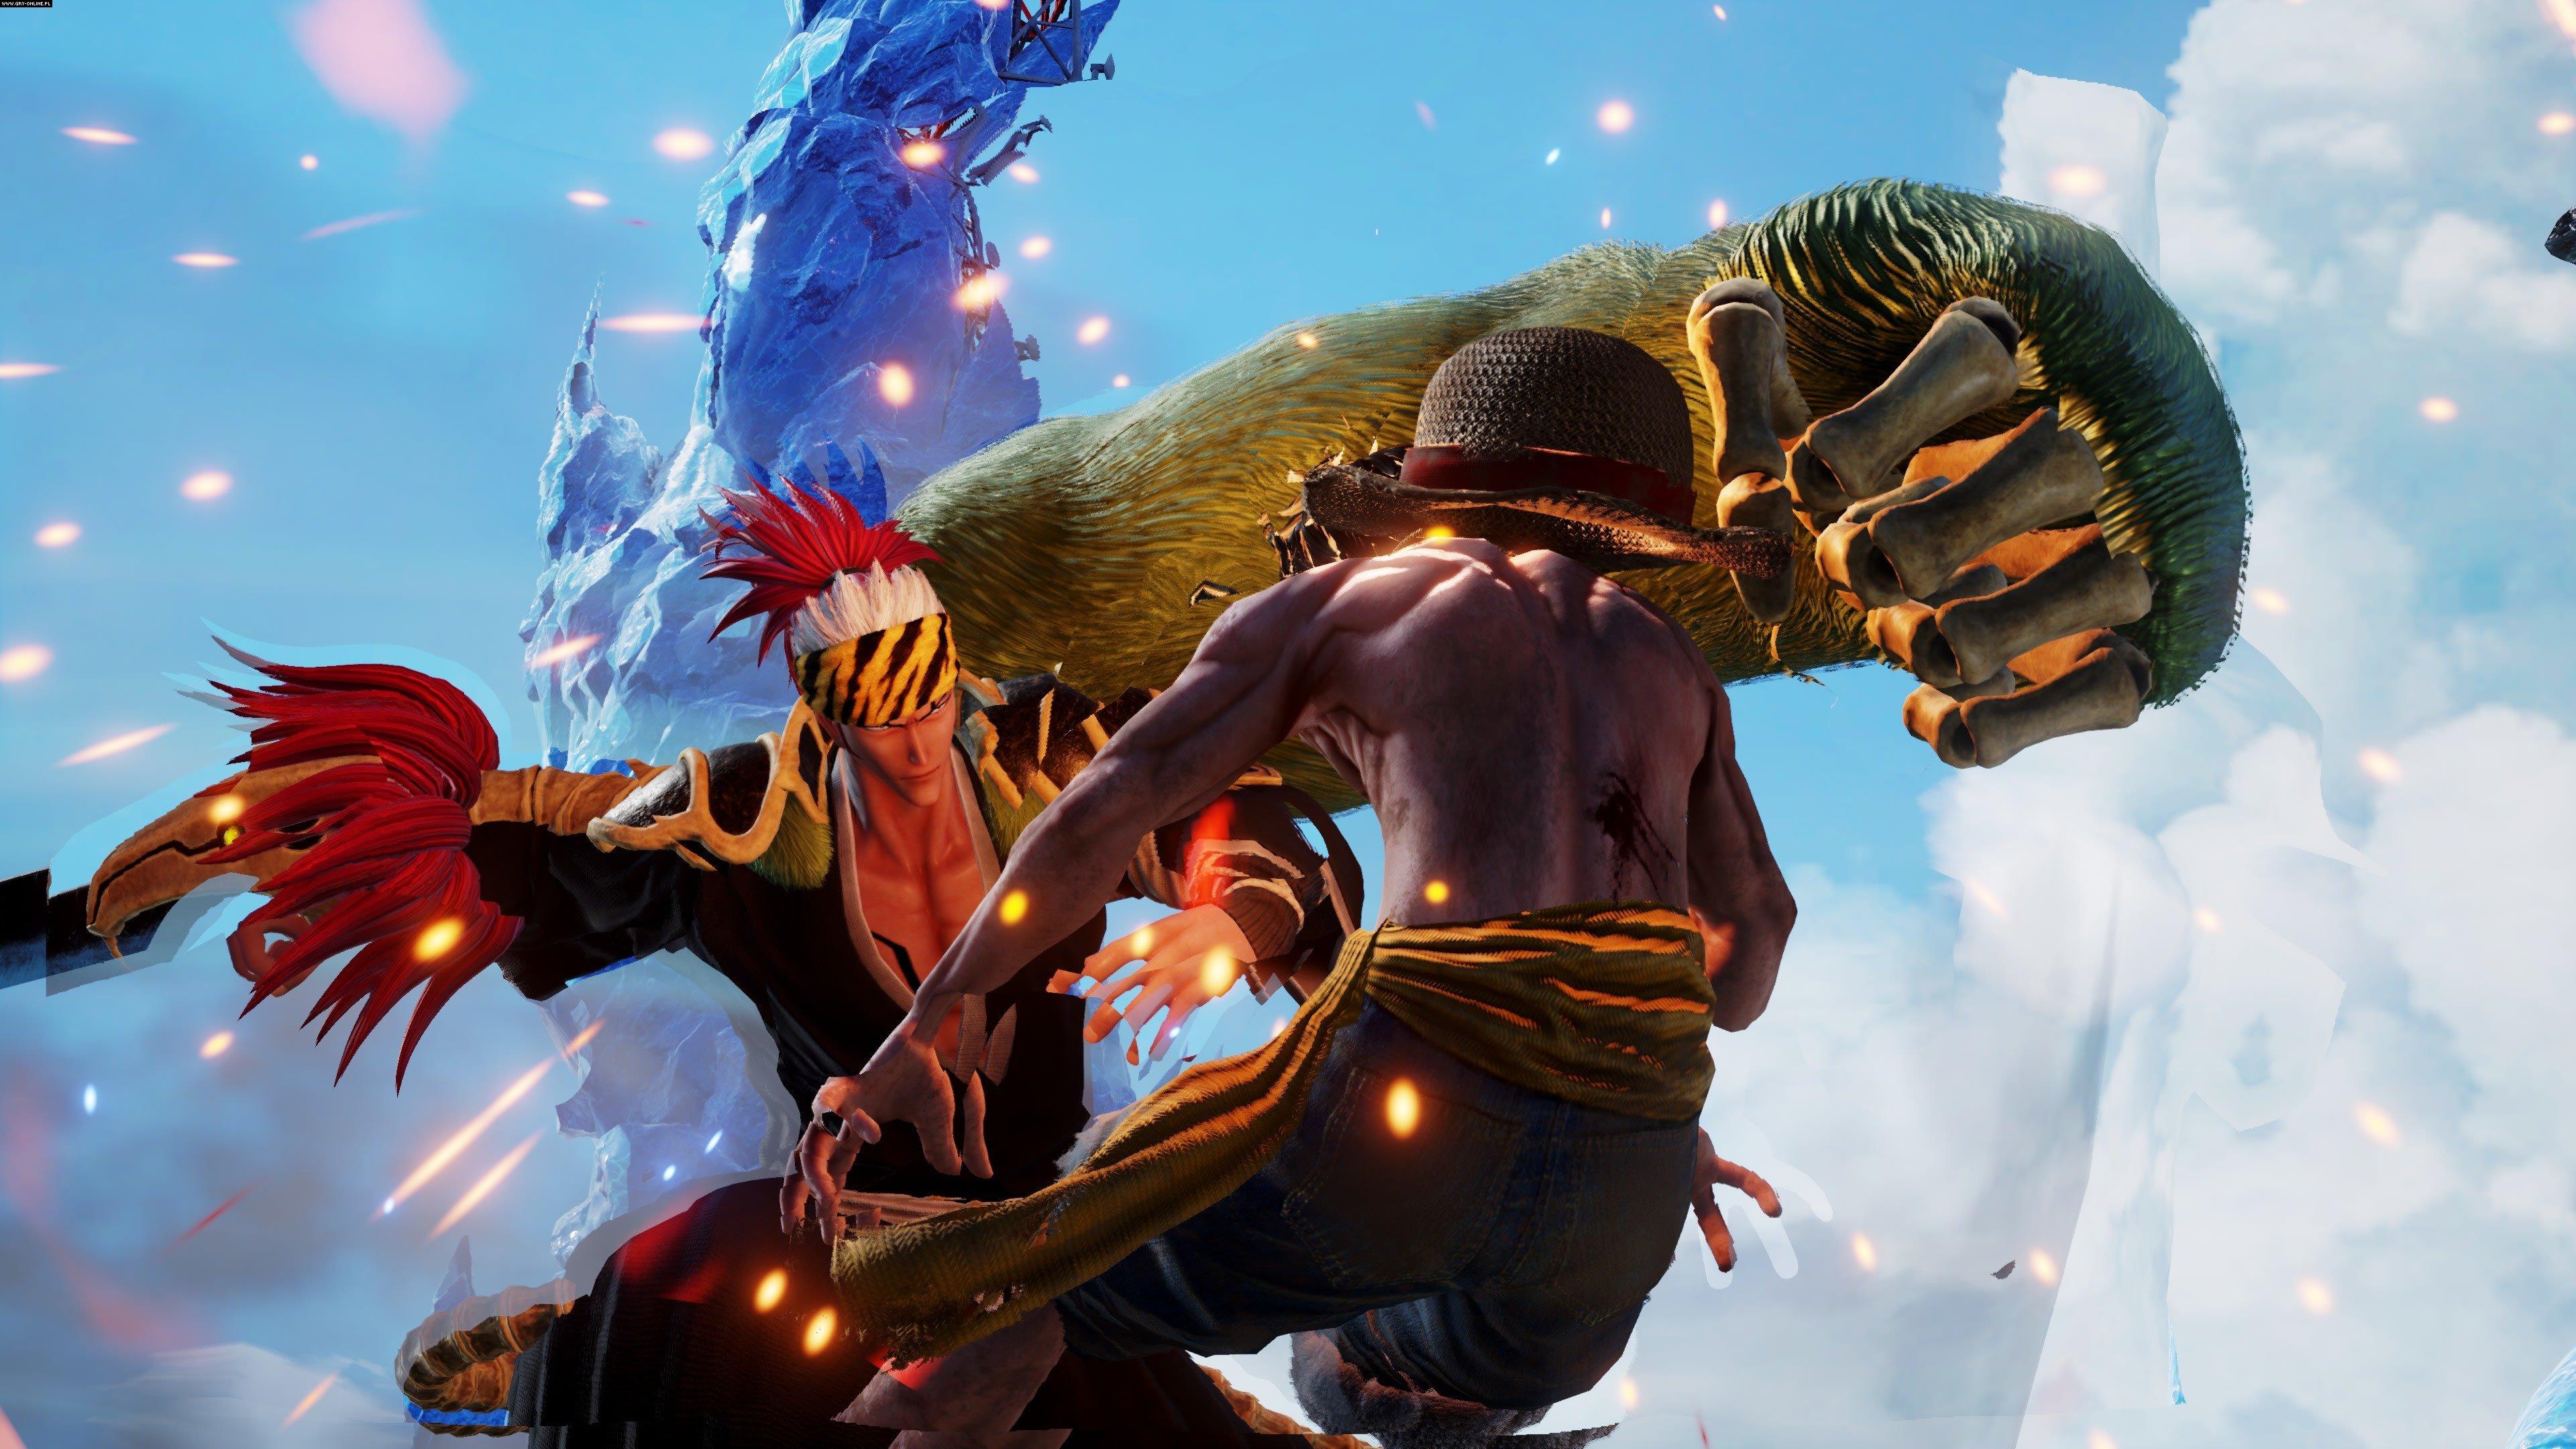 Jump Force PC, PS4, XONE Games Image 66/212, Spike Chunsoft, Bandai Namco Entertainment